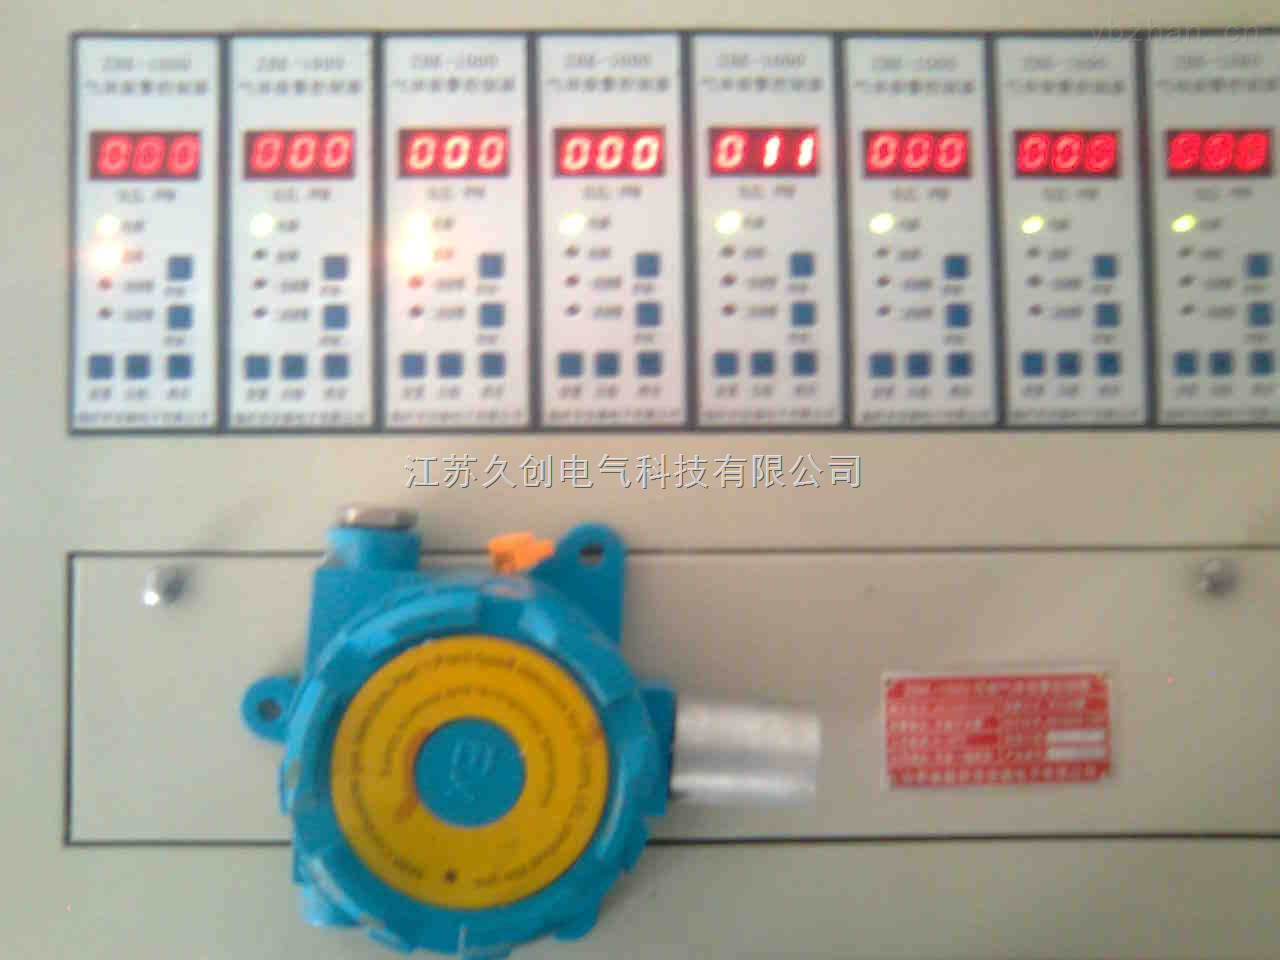 JC-QD633 氣體探測器(帶本地顯示)